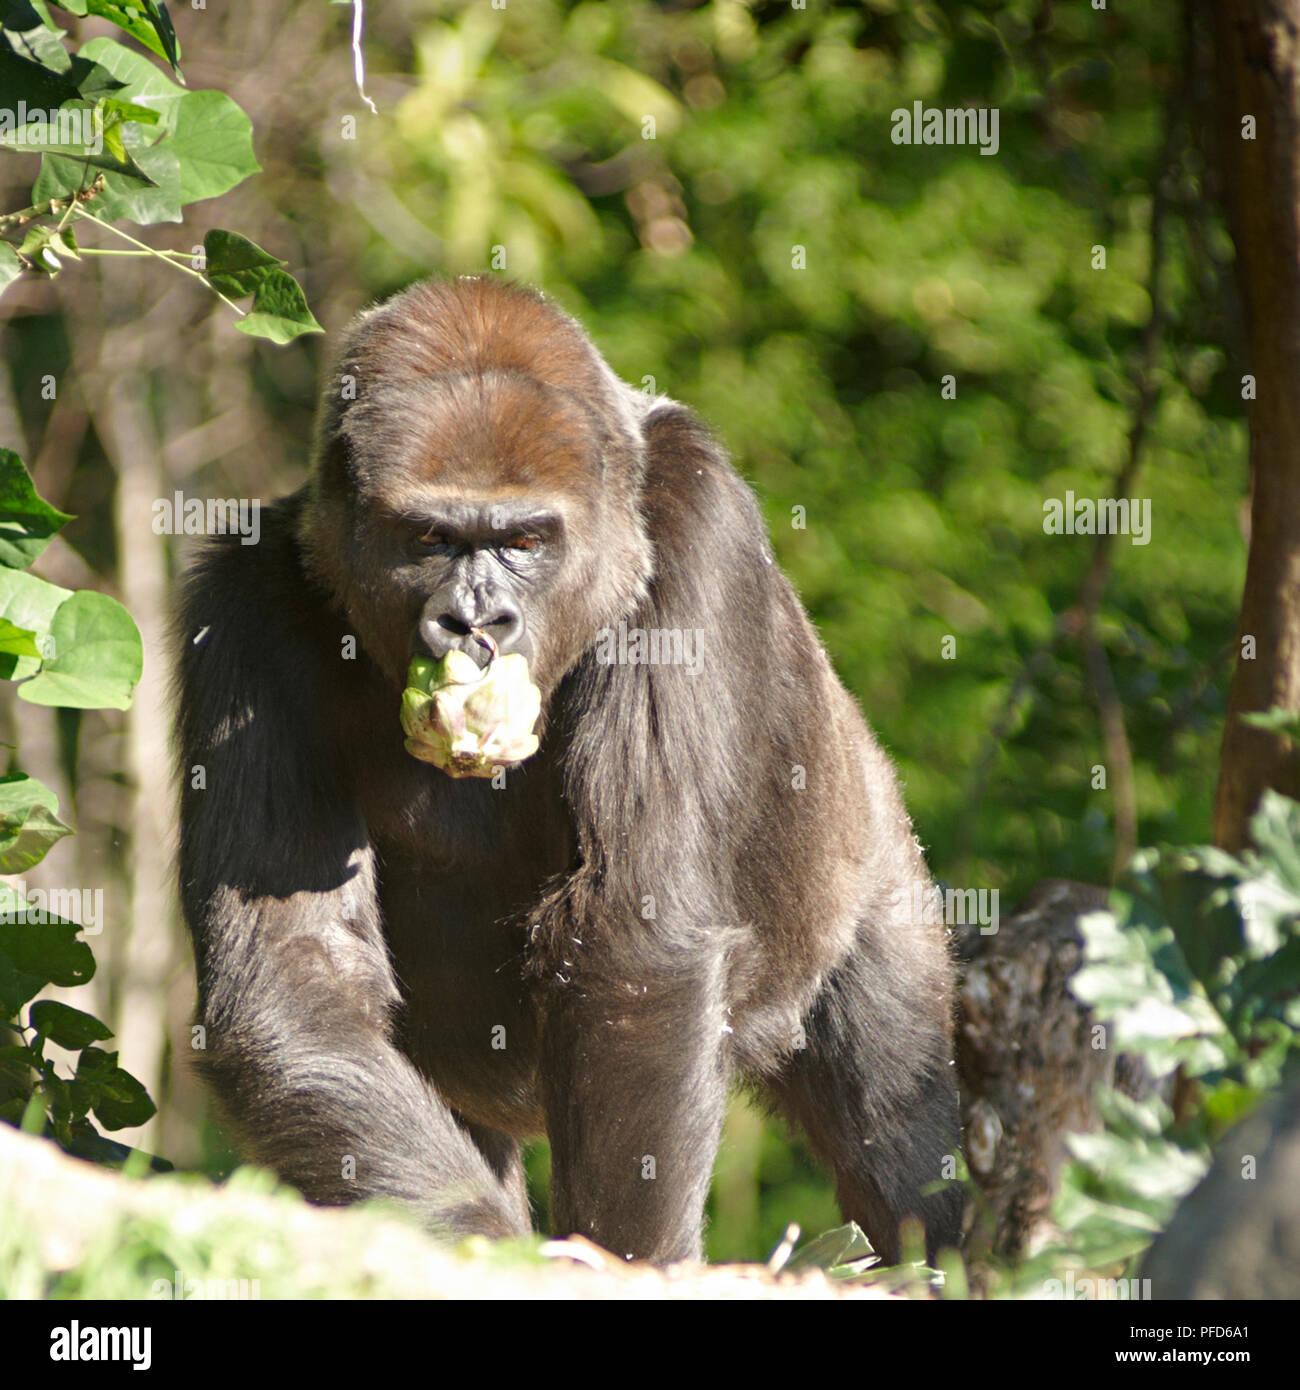 Gorilla at Melbourne Zoo. Melbourne - Stock Image